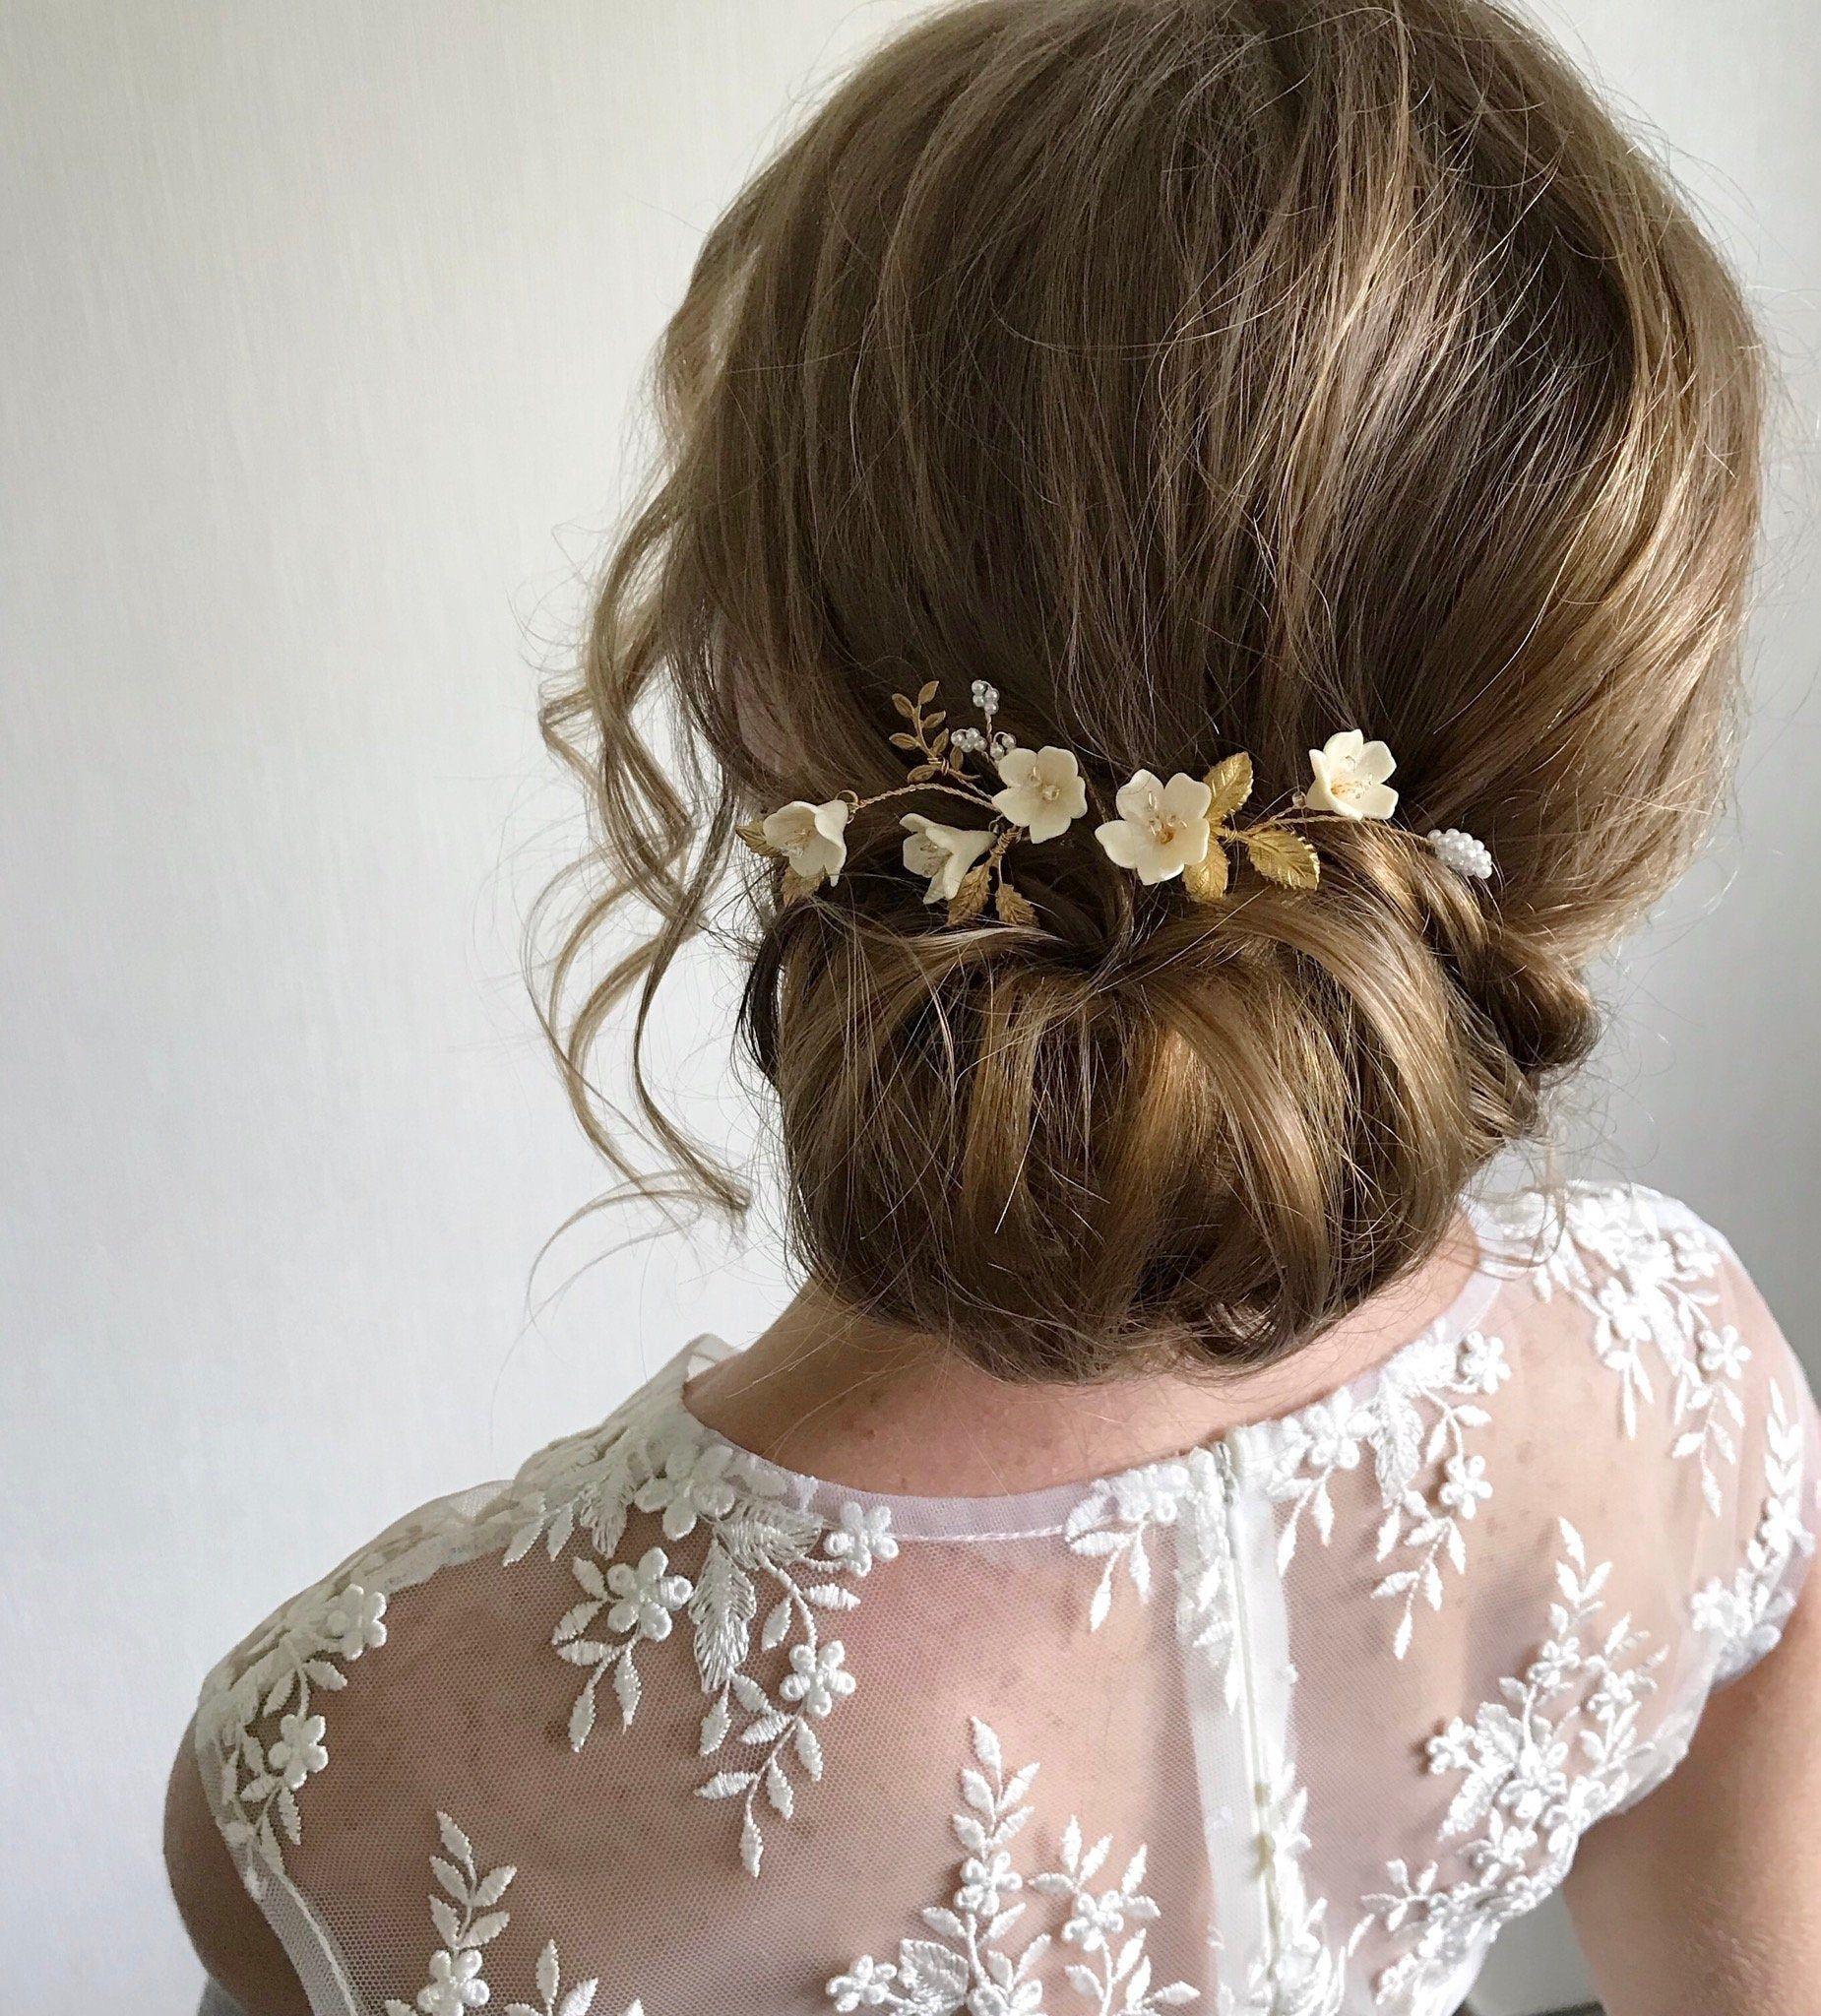 Bridal Floral Hair Pins Gold Silver Wedding Hair Etsy In 2020 Flower Girl Hairstyles Wedding Hair Pieces Bridesmaid Hair Clips